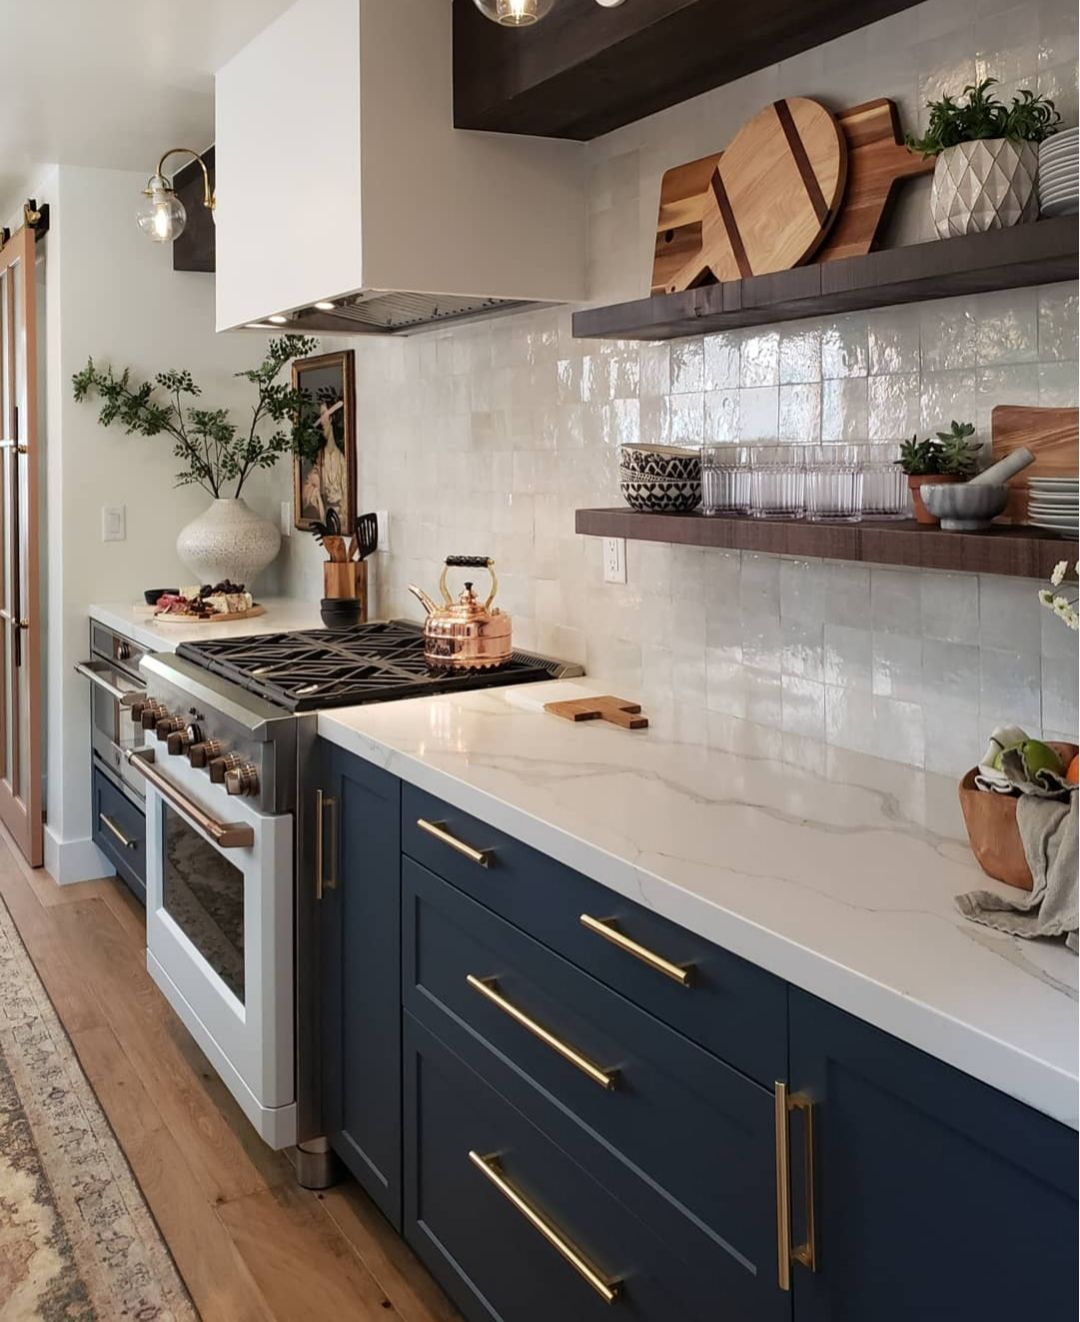 Kismet House Kitchen Remodel Coastal Style Quartz Countertops Dark Cabinets In 2020 Interior Design Kitchen Home Decor Kitchen New Kitchen Cabinets